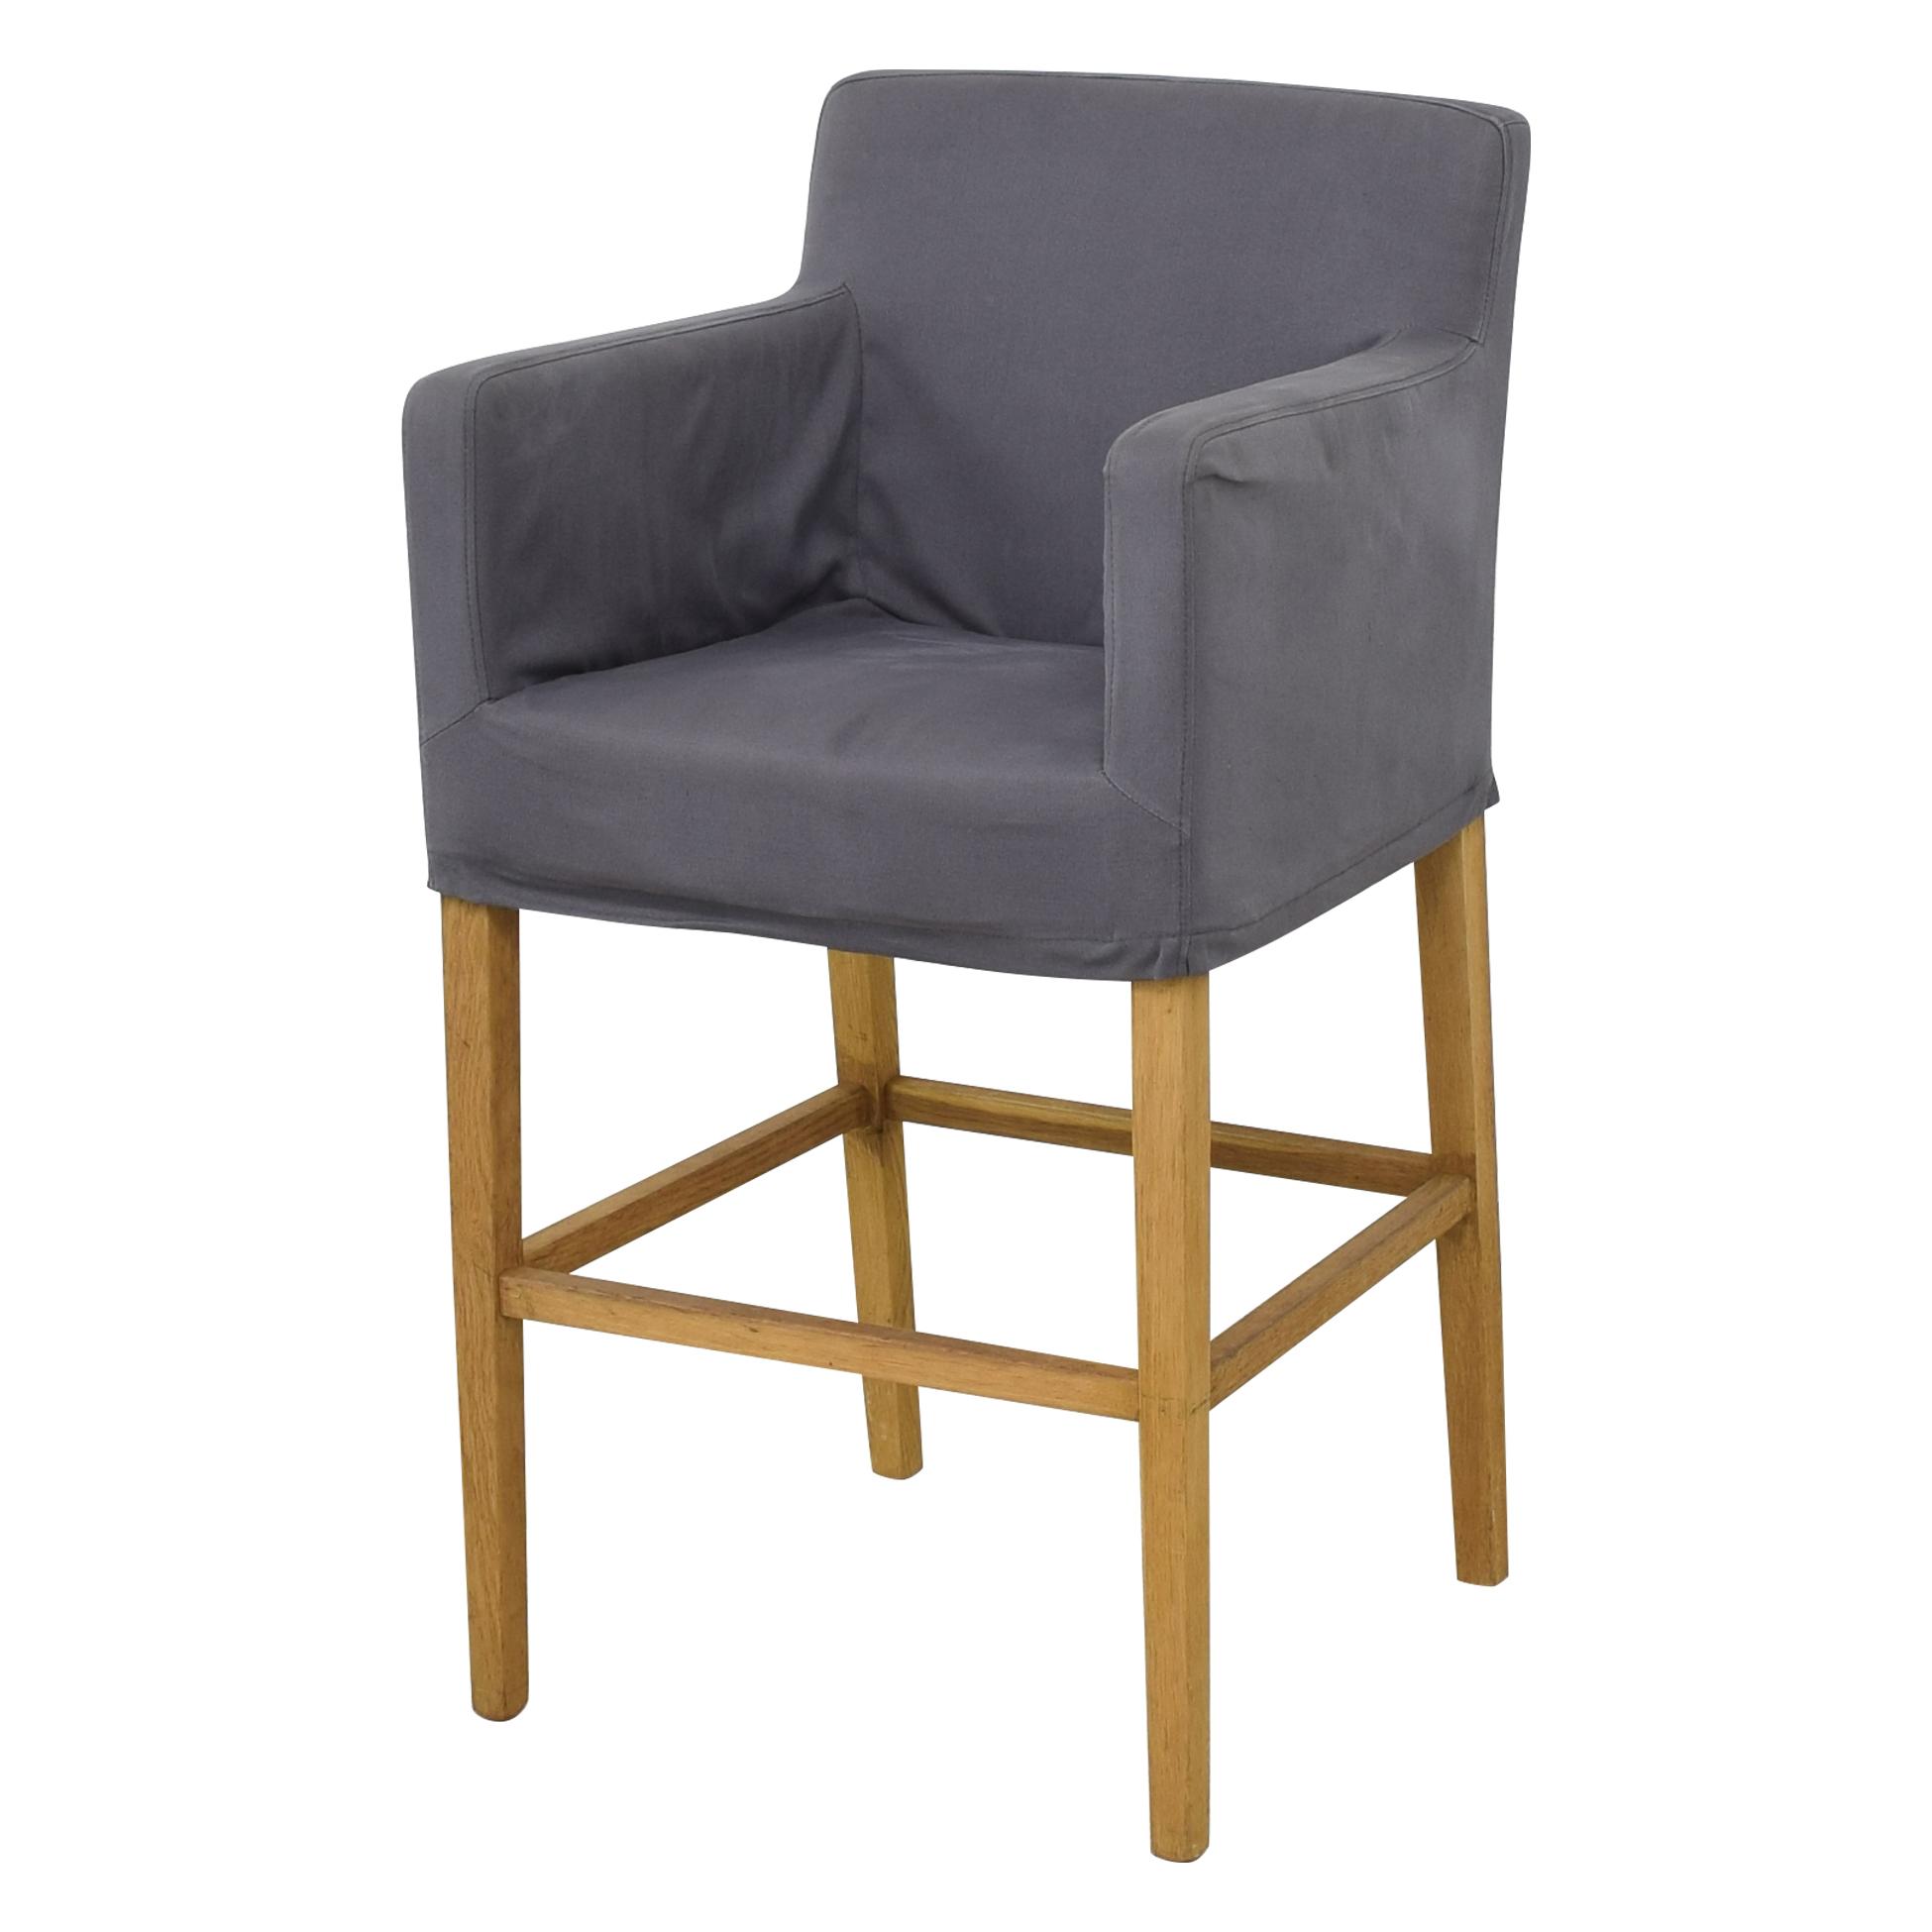 HomeGoods Bar Stools / Chairs